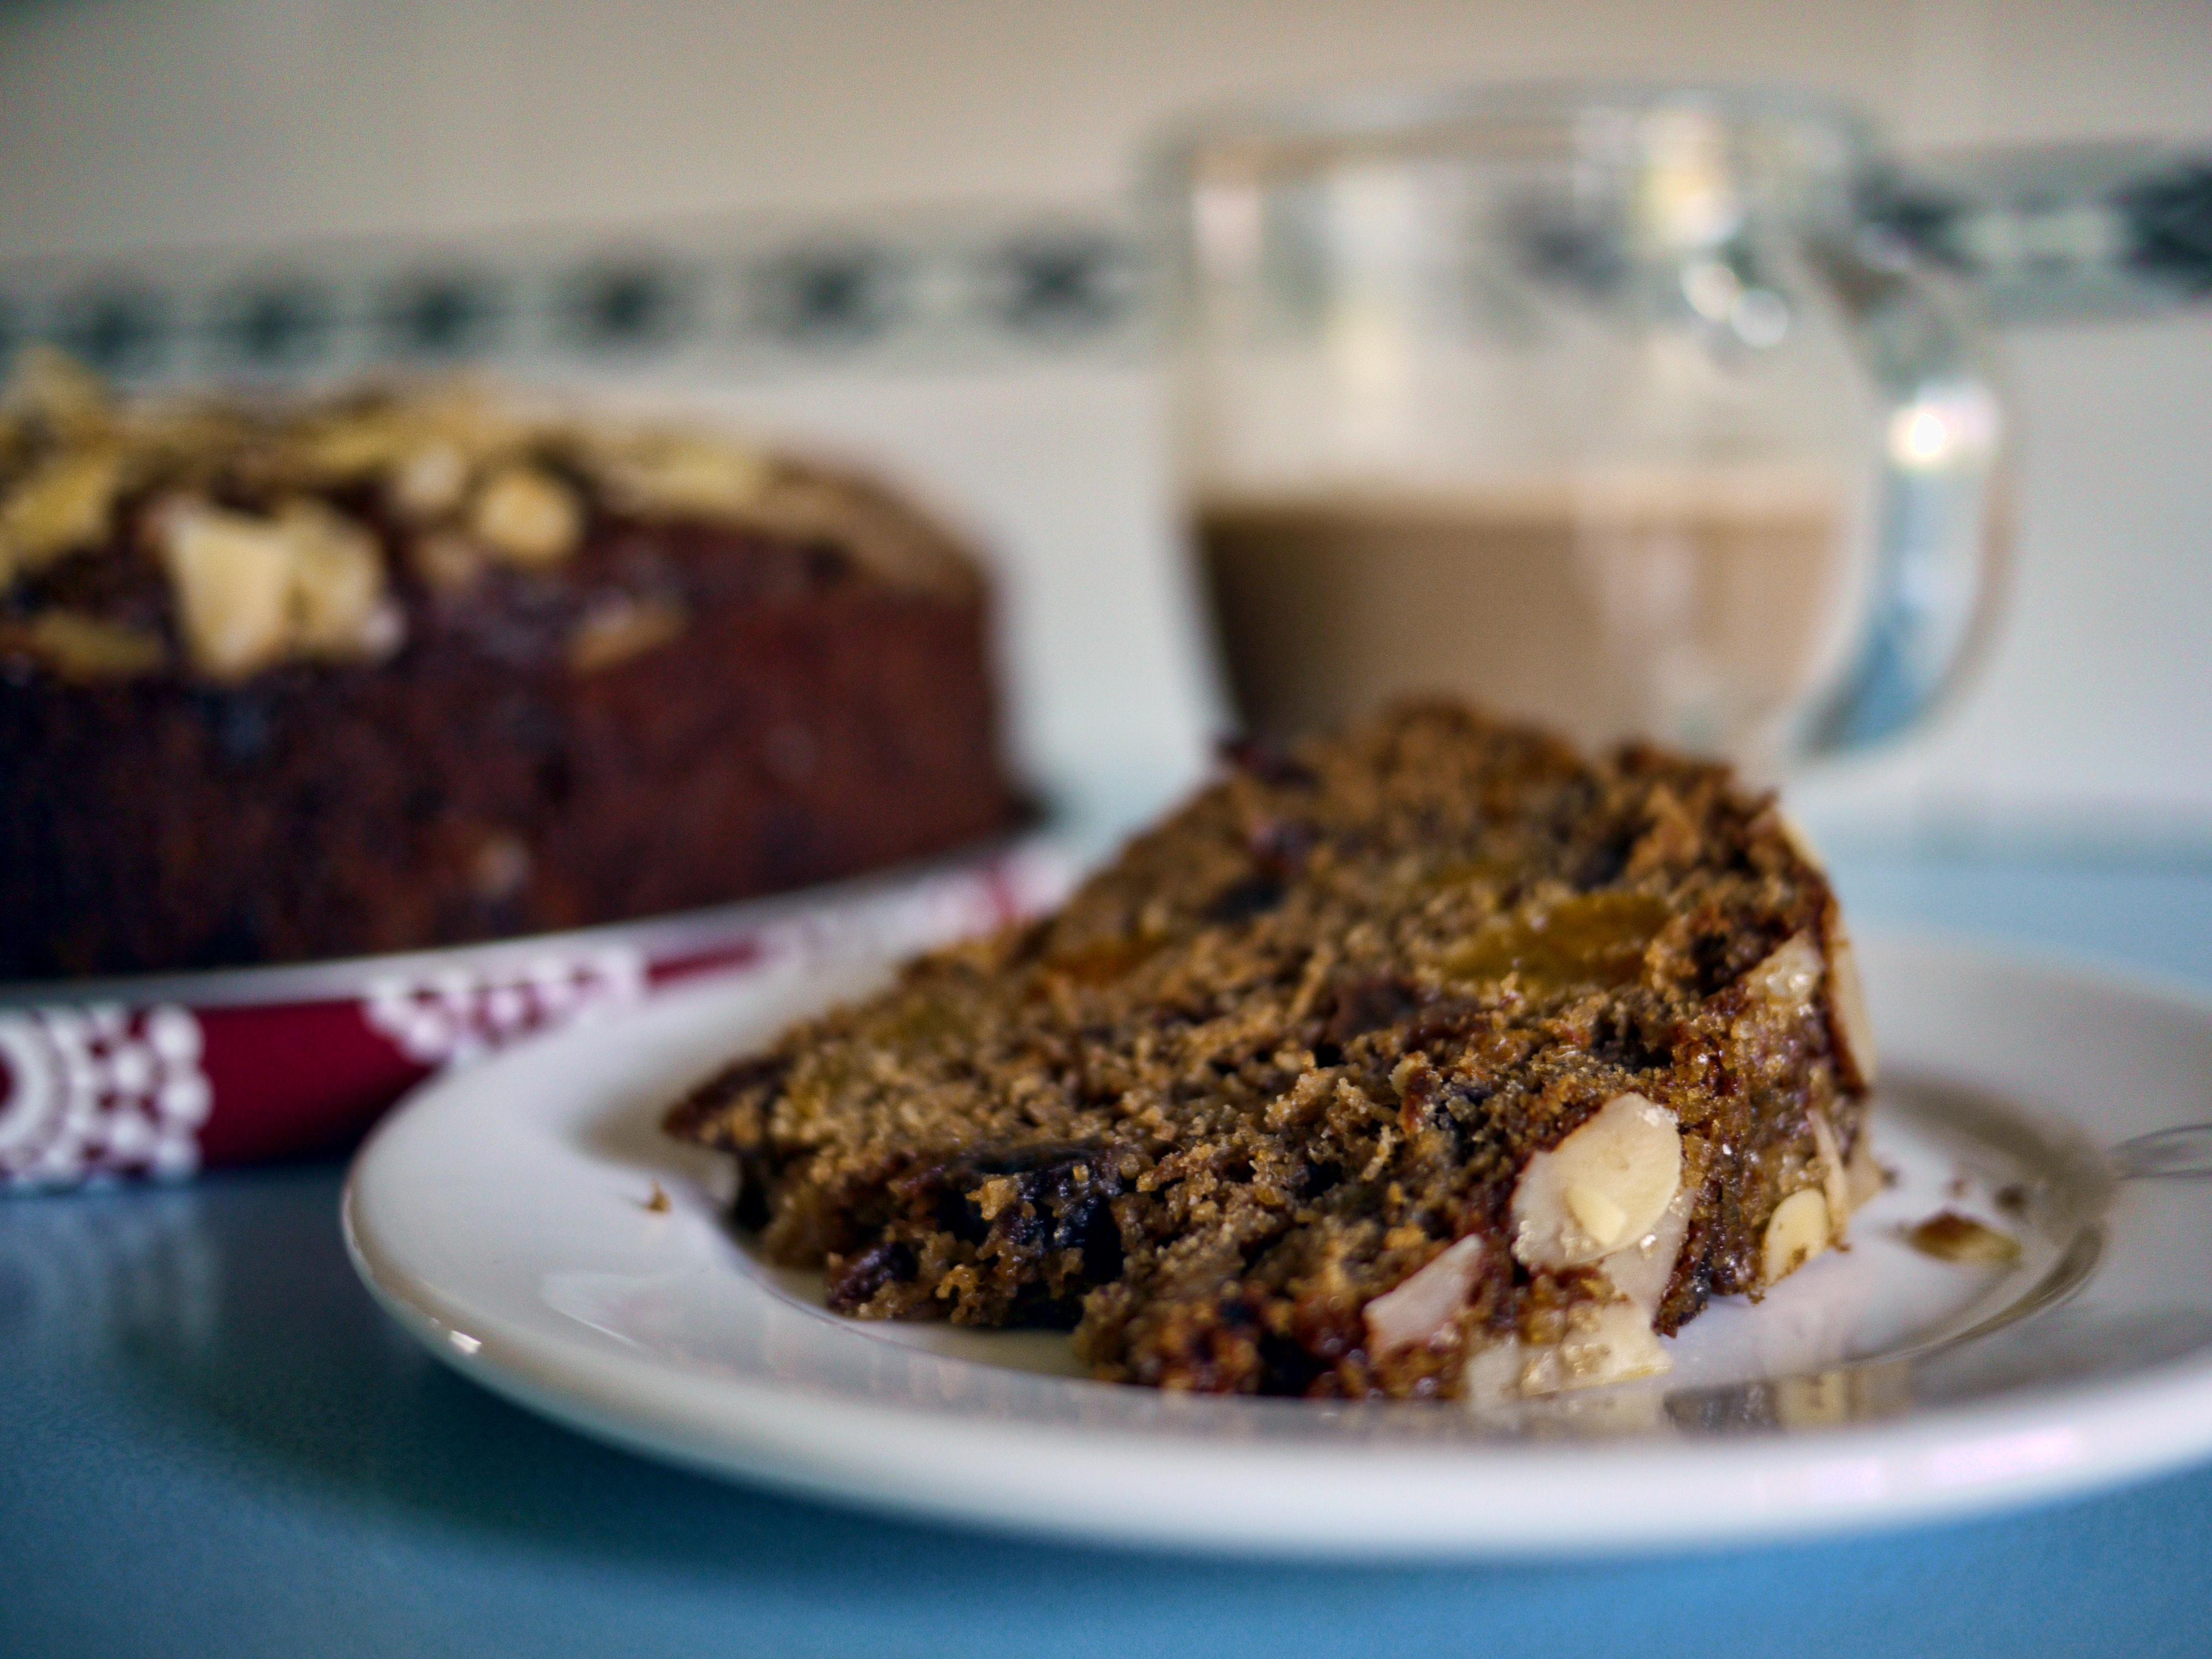 Sliced Cake on White Ceramic Plate, Baked, Food, Sweet, Sugar, HQ Photo